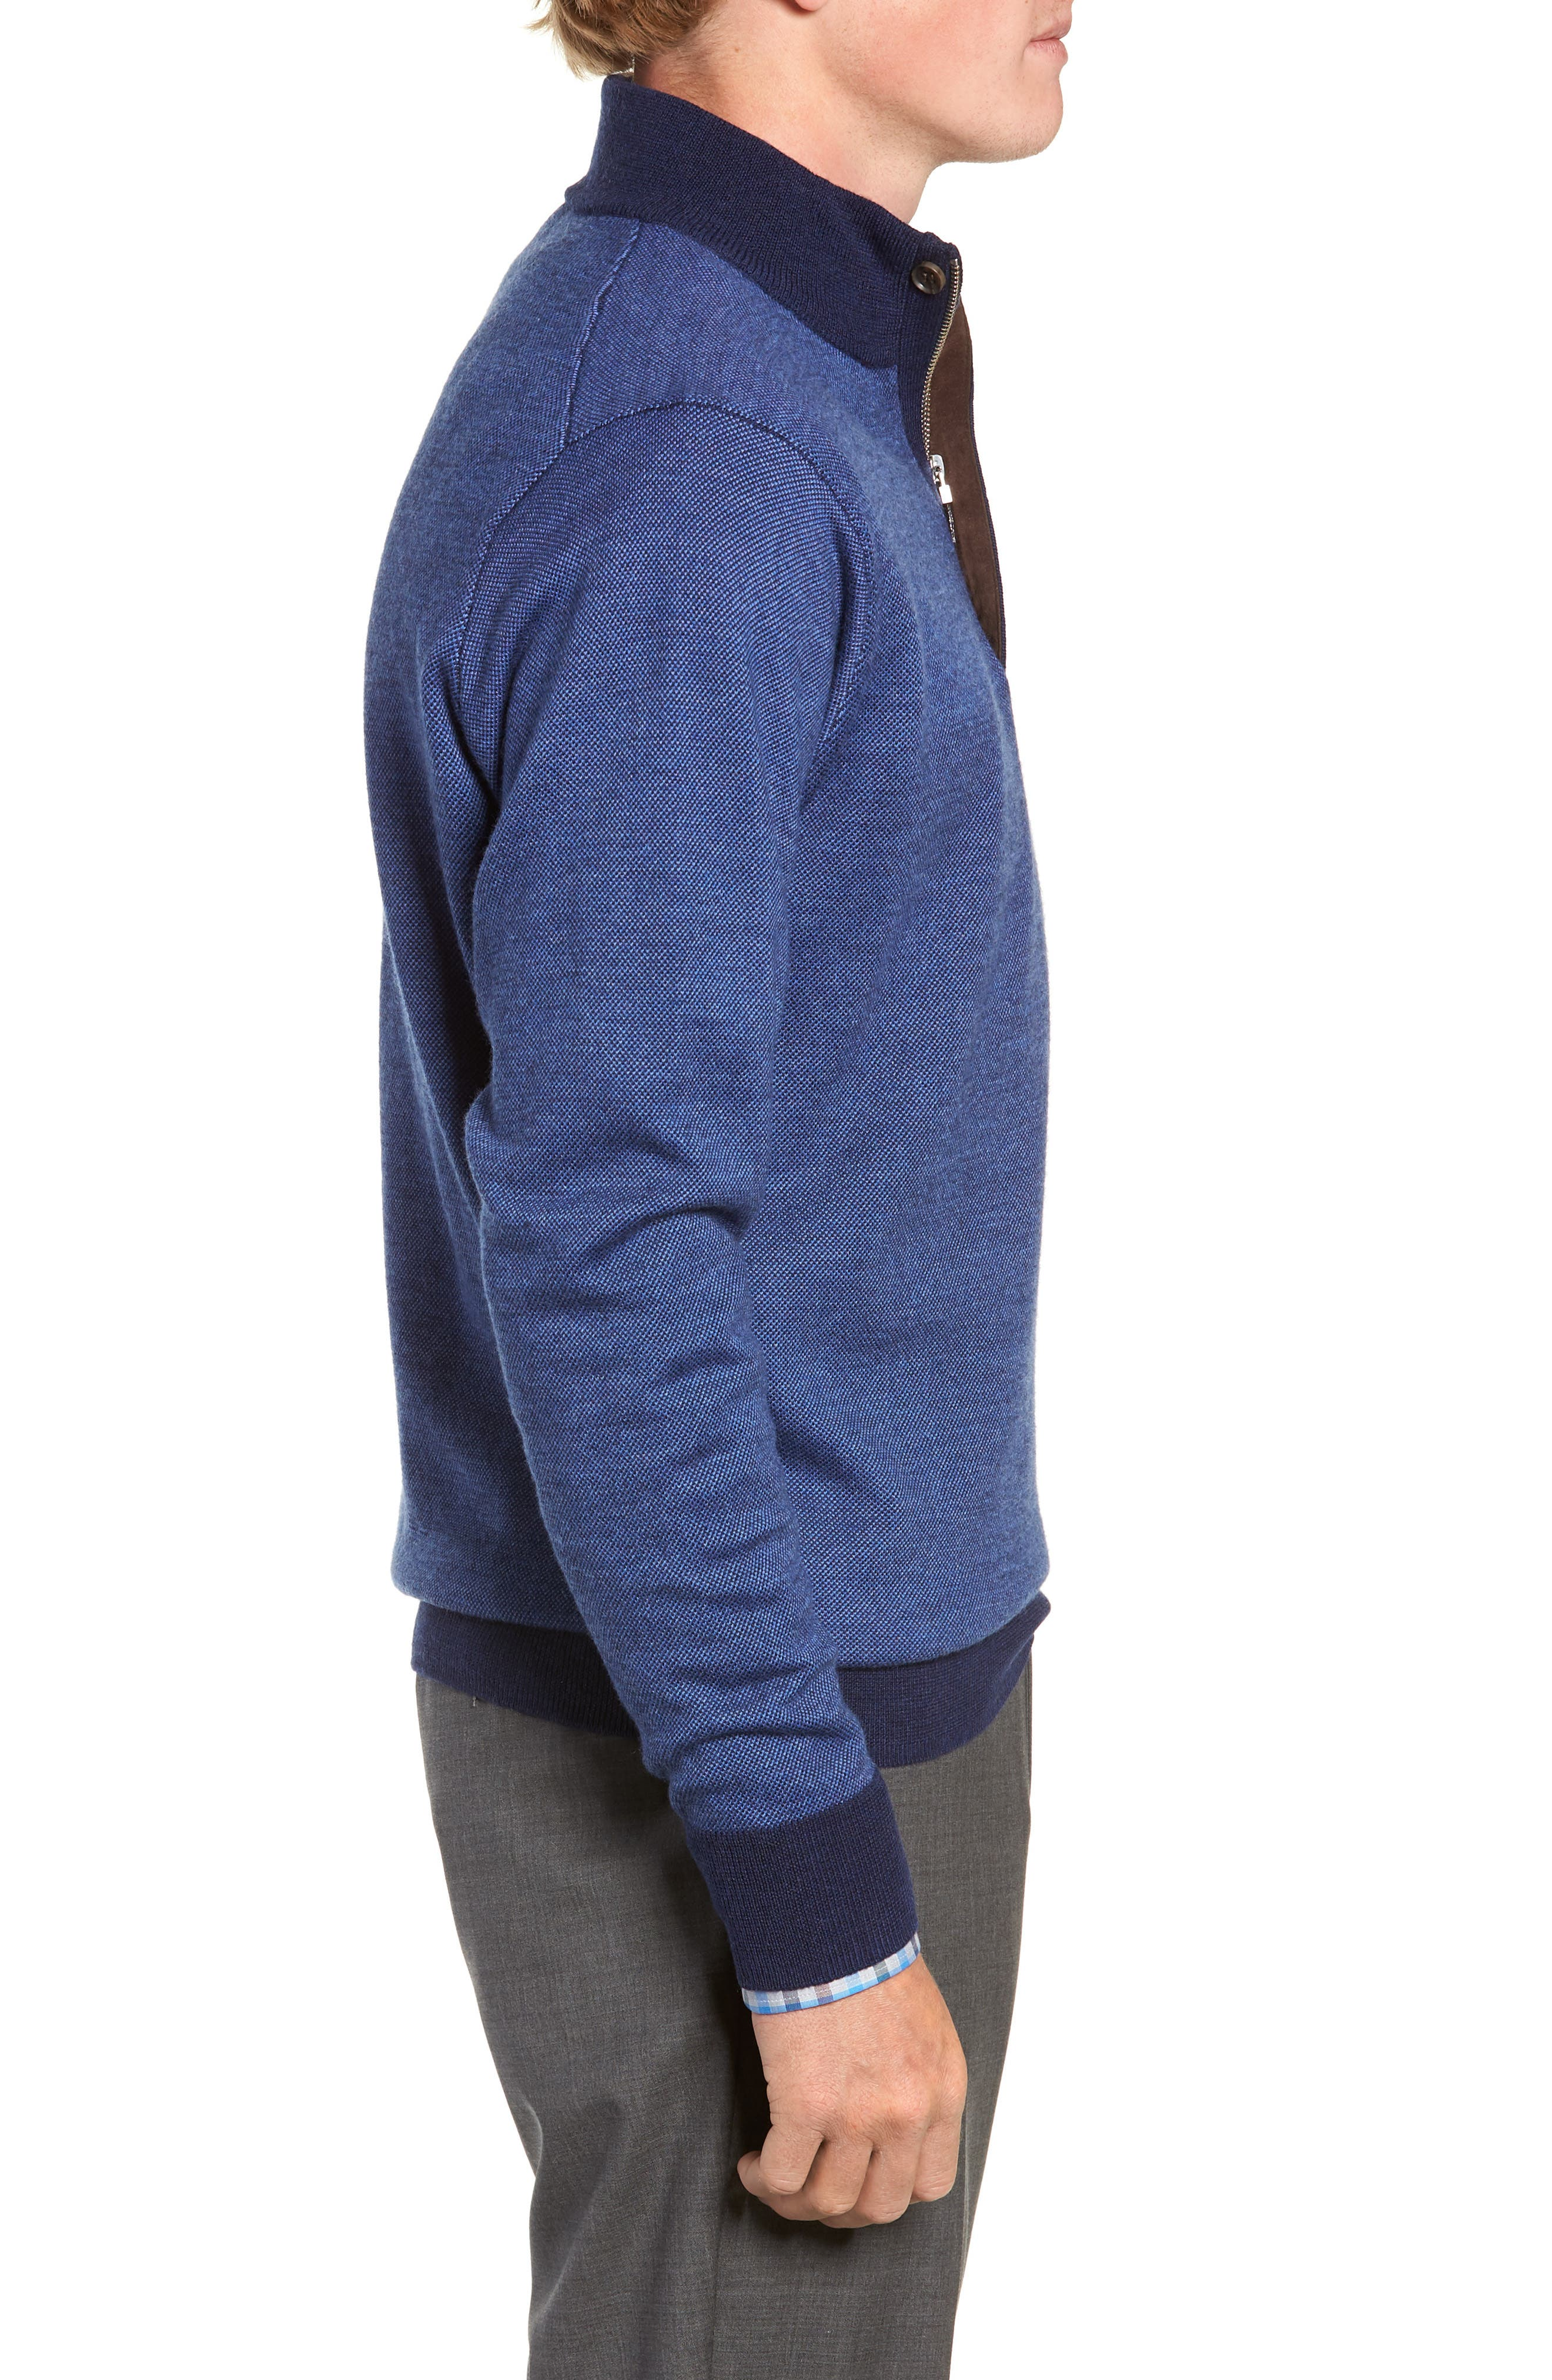 Birdseye Merino Wool Quarter Zip Sweater,                             Alternate thumbnail 3, color,                             PLAZA BLUE